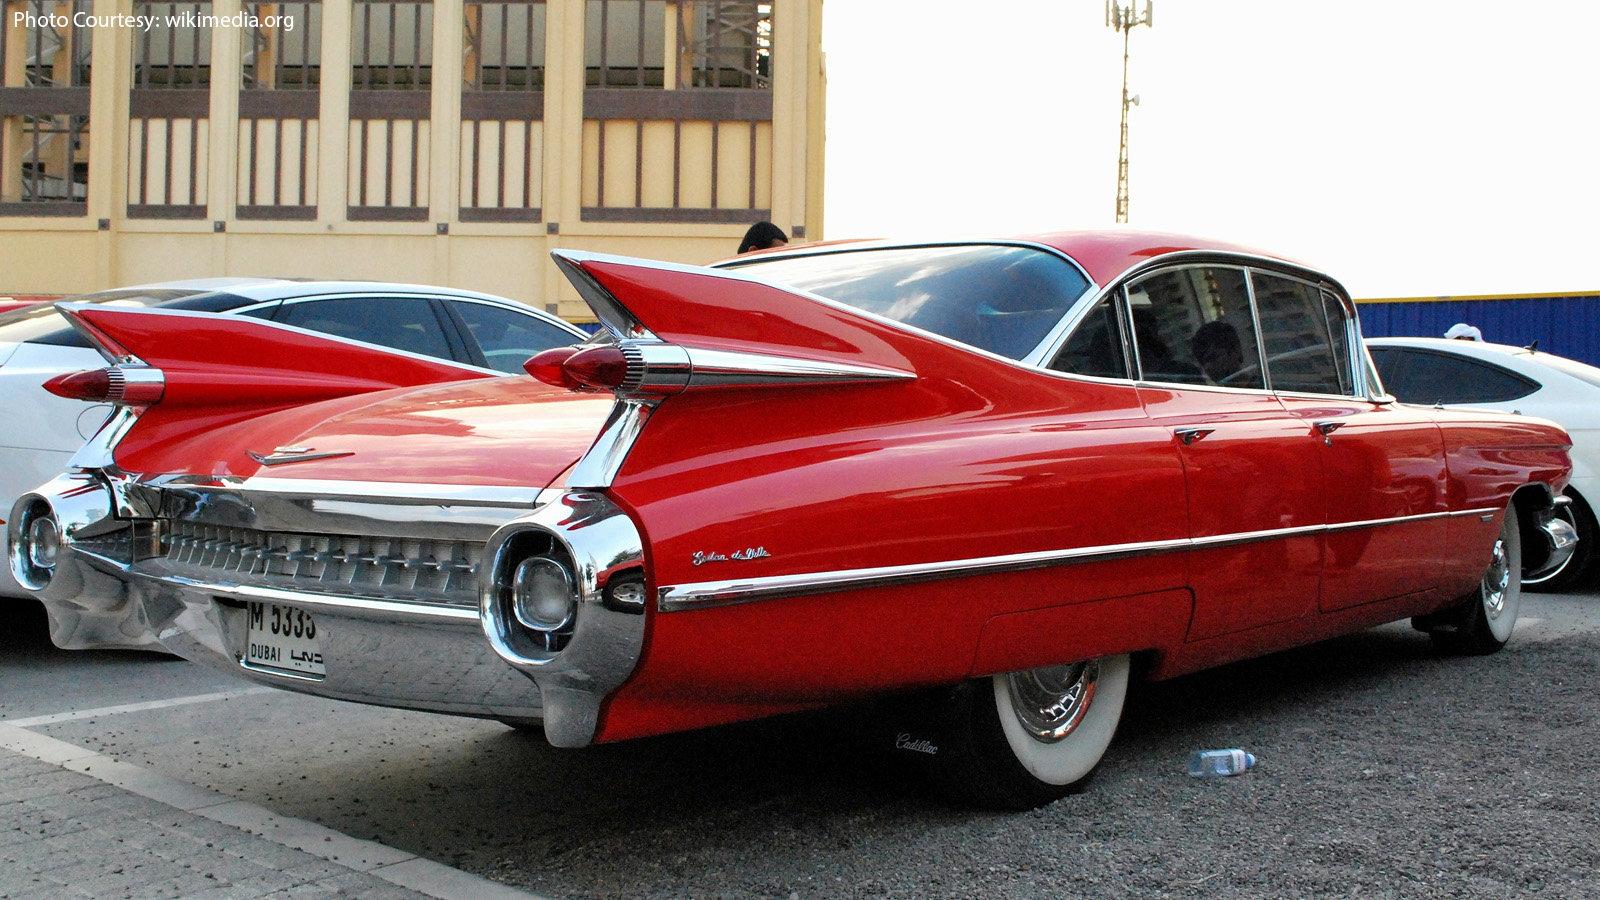 1959 Cadillac De Ville